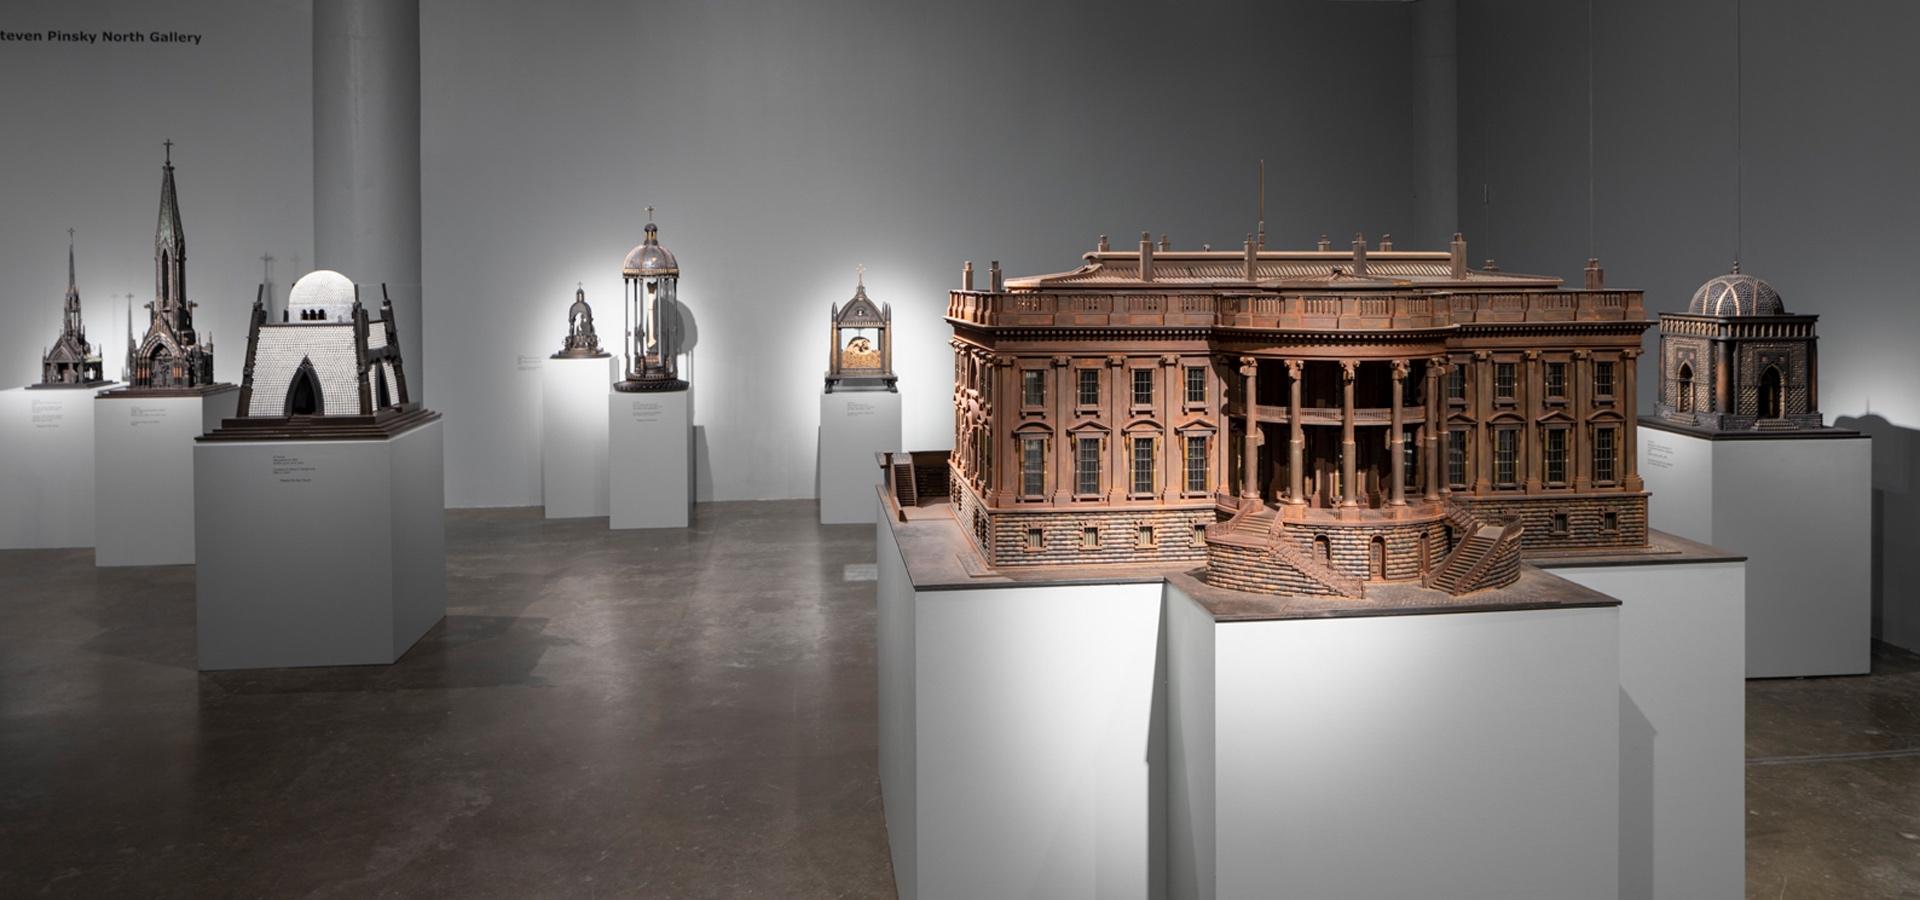 Al Farrow, Museum of Craft and Design